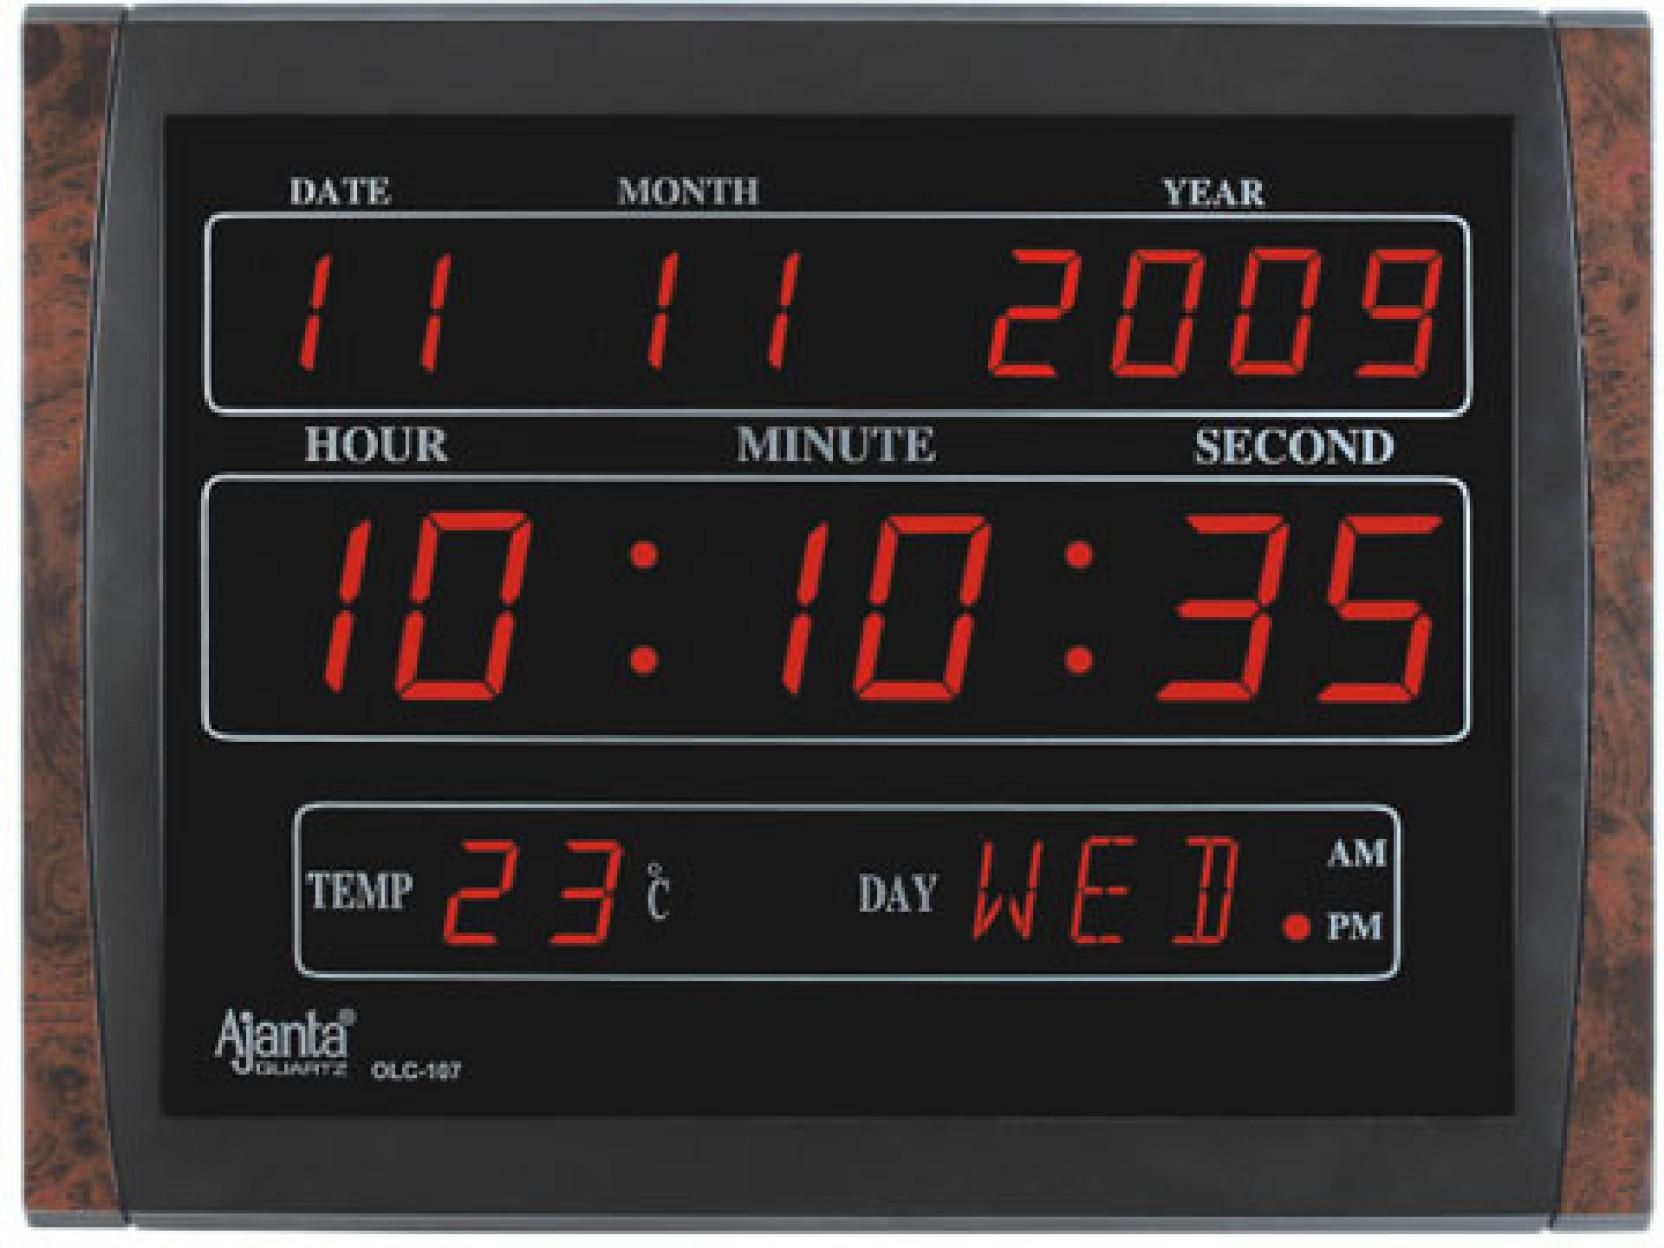 Ajanta Digital Wall Clock Price In India Buy Ajanta